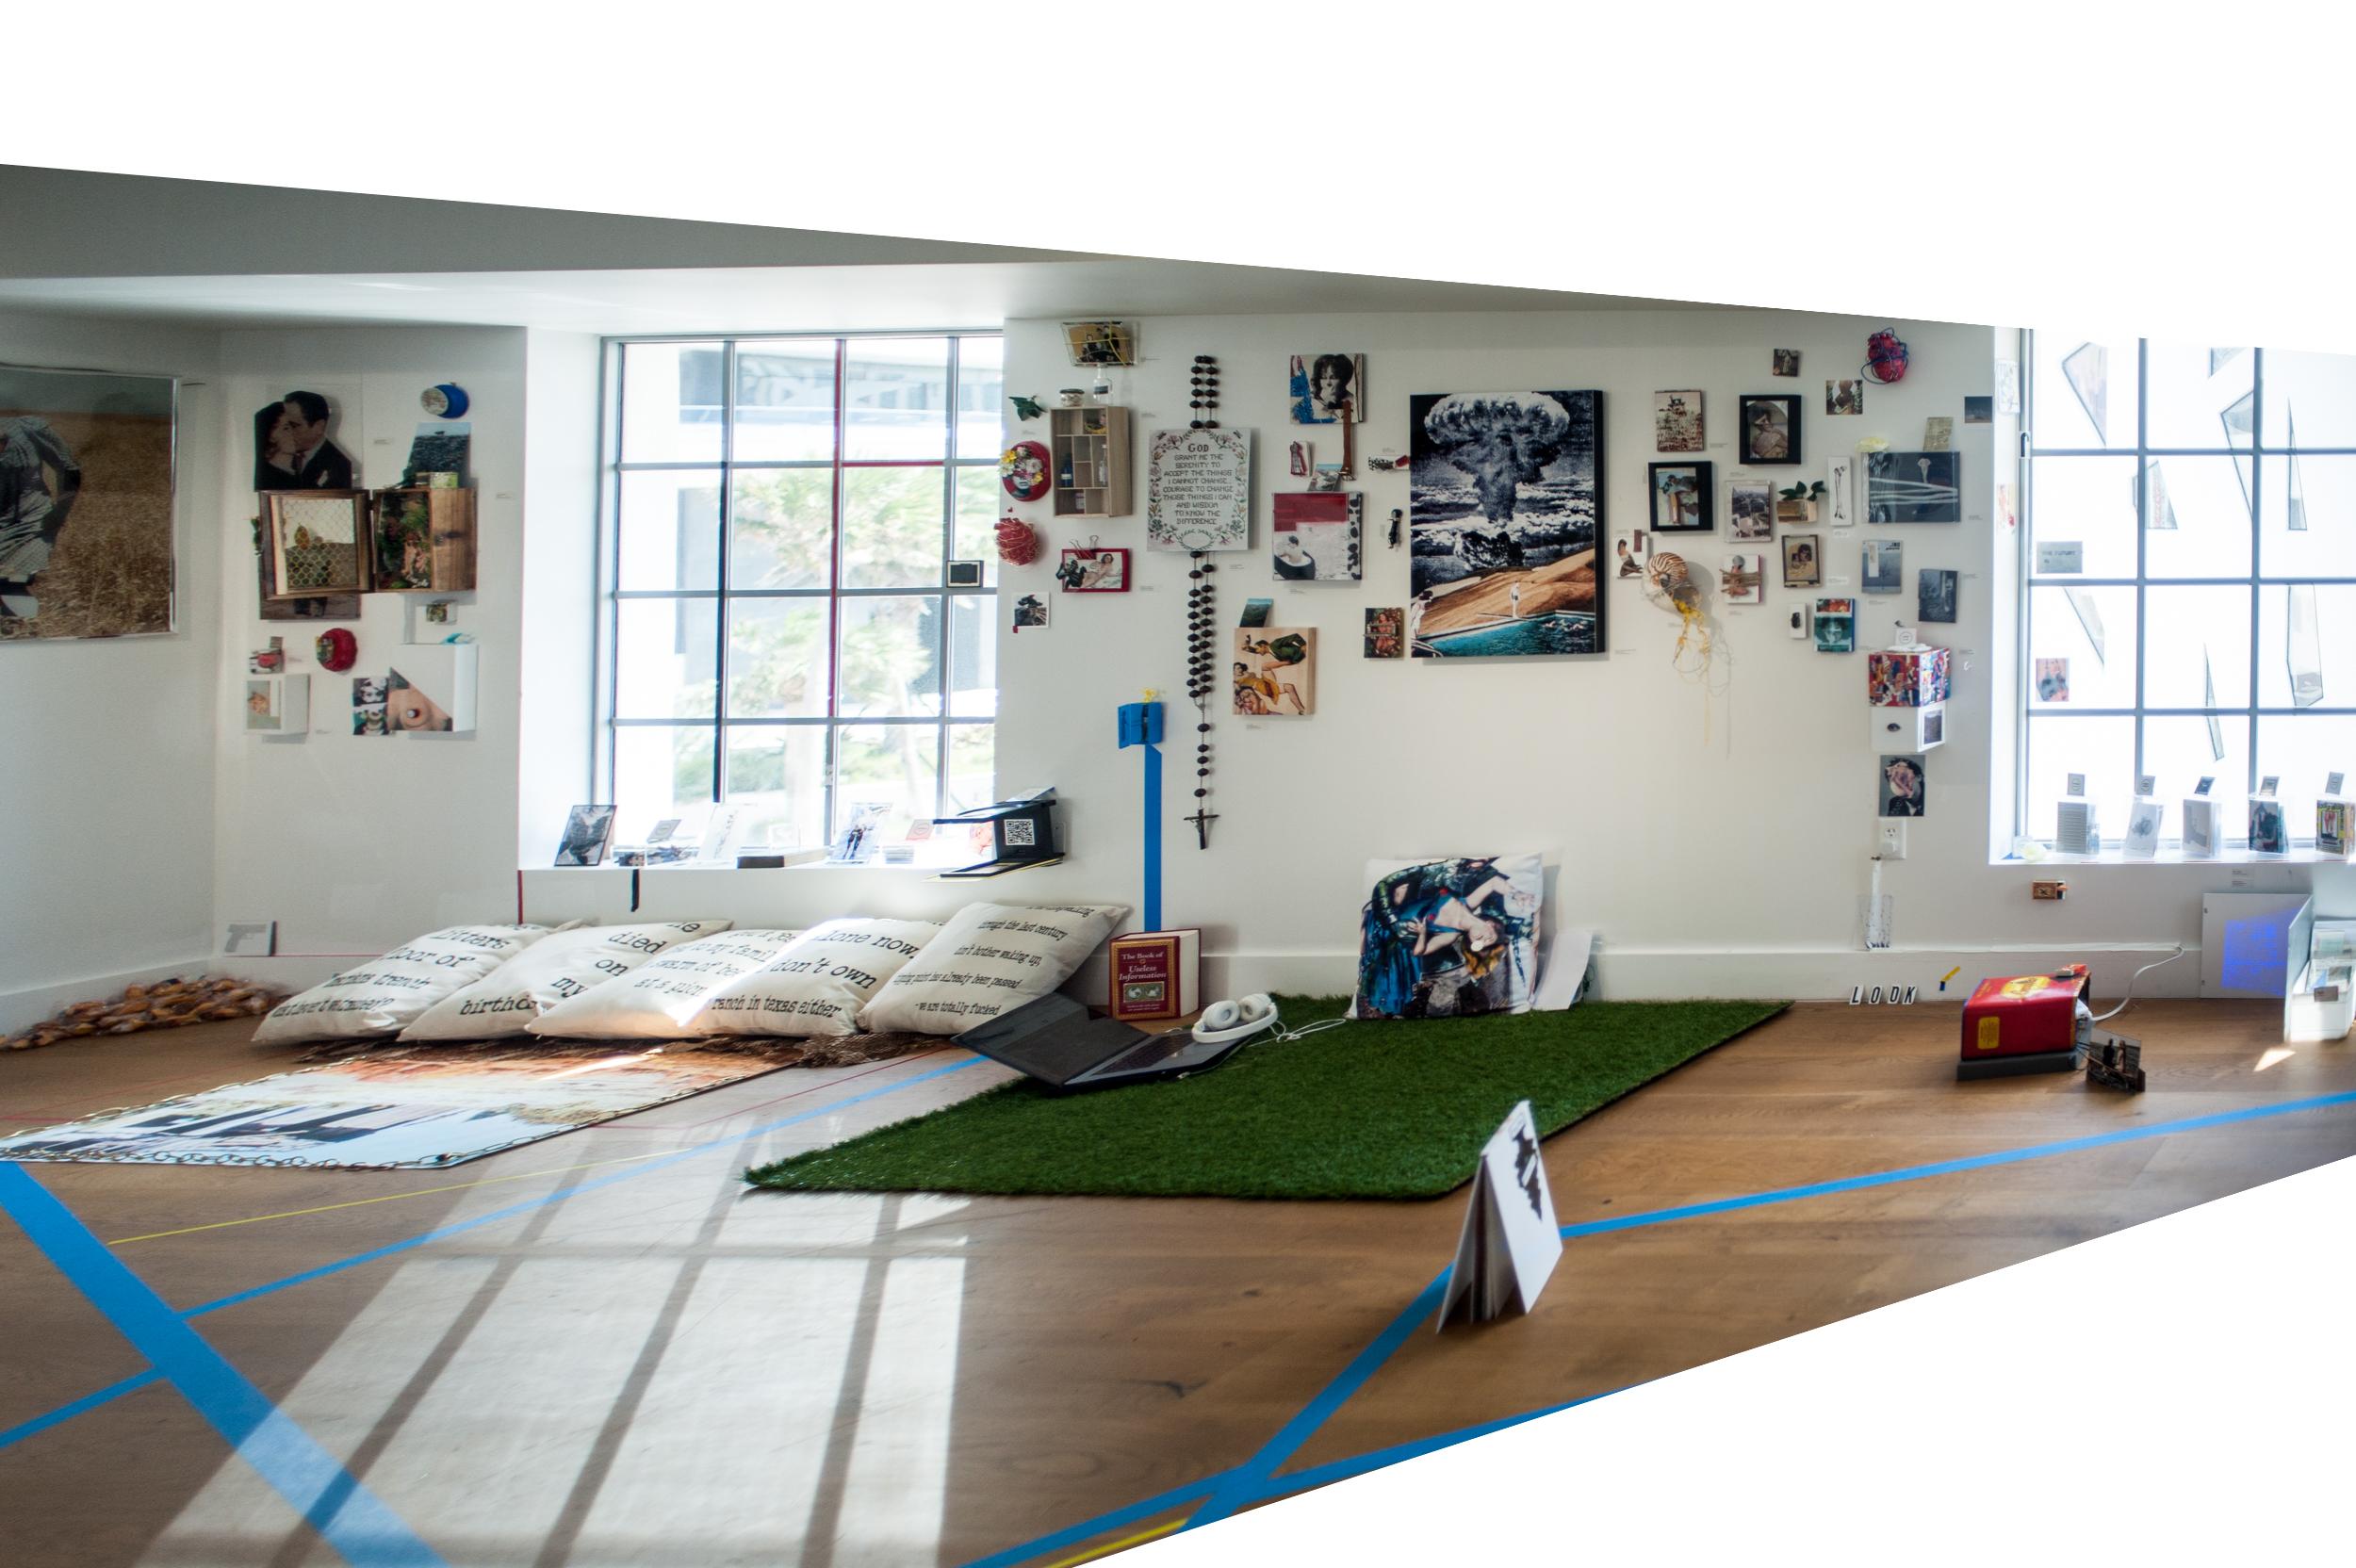 Faena-Exhibition-Images-72.jpg